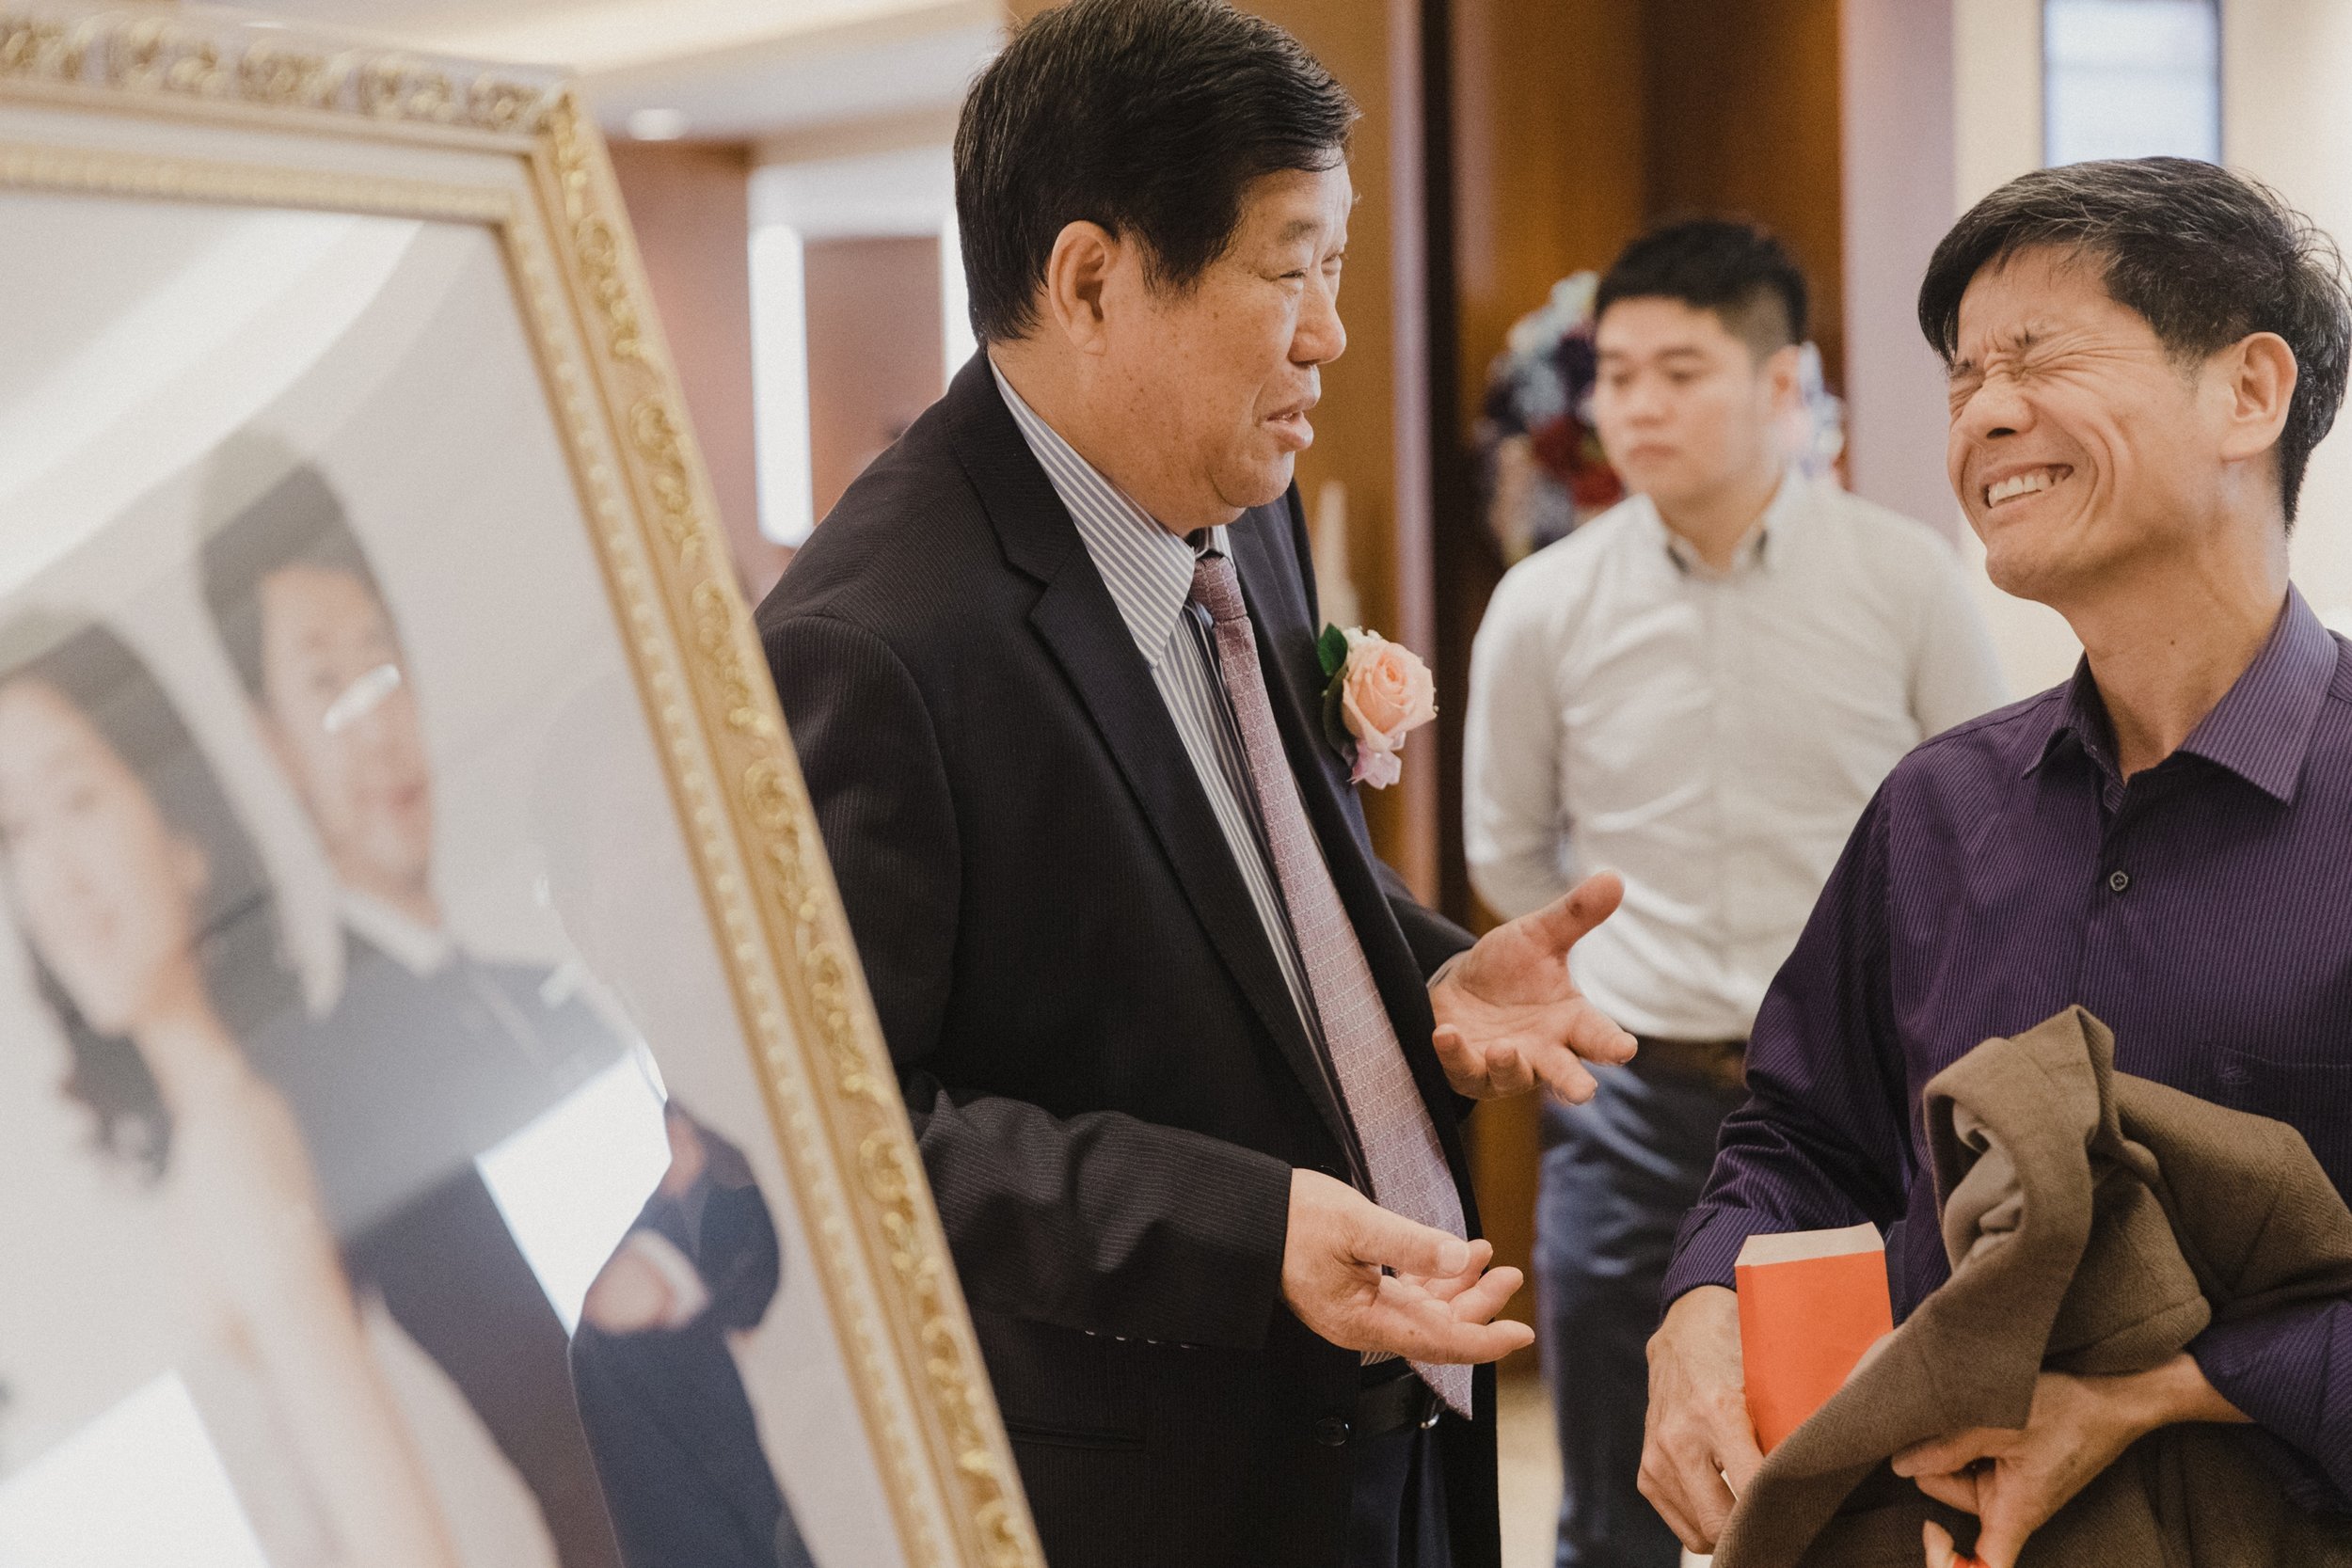 wedding-caridee-oscar-lunch-ambassador-hsinchu-結婚午宴-新竹國賓_42.jpg